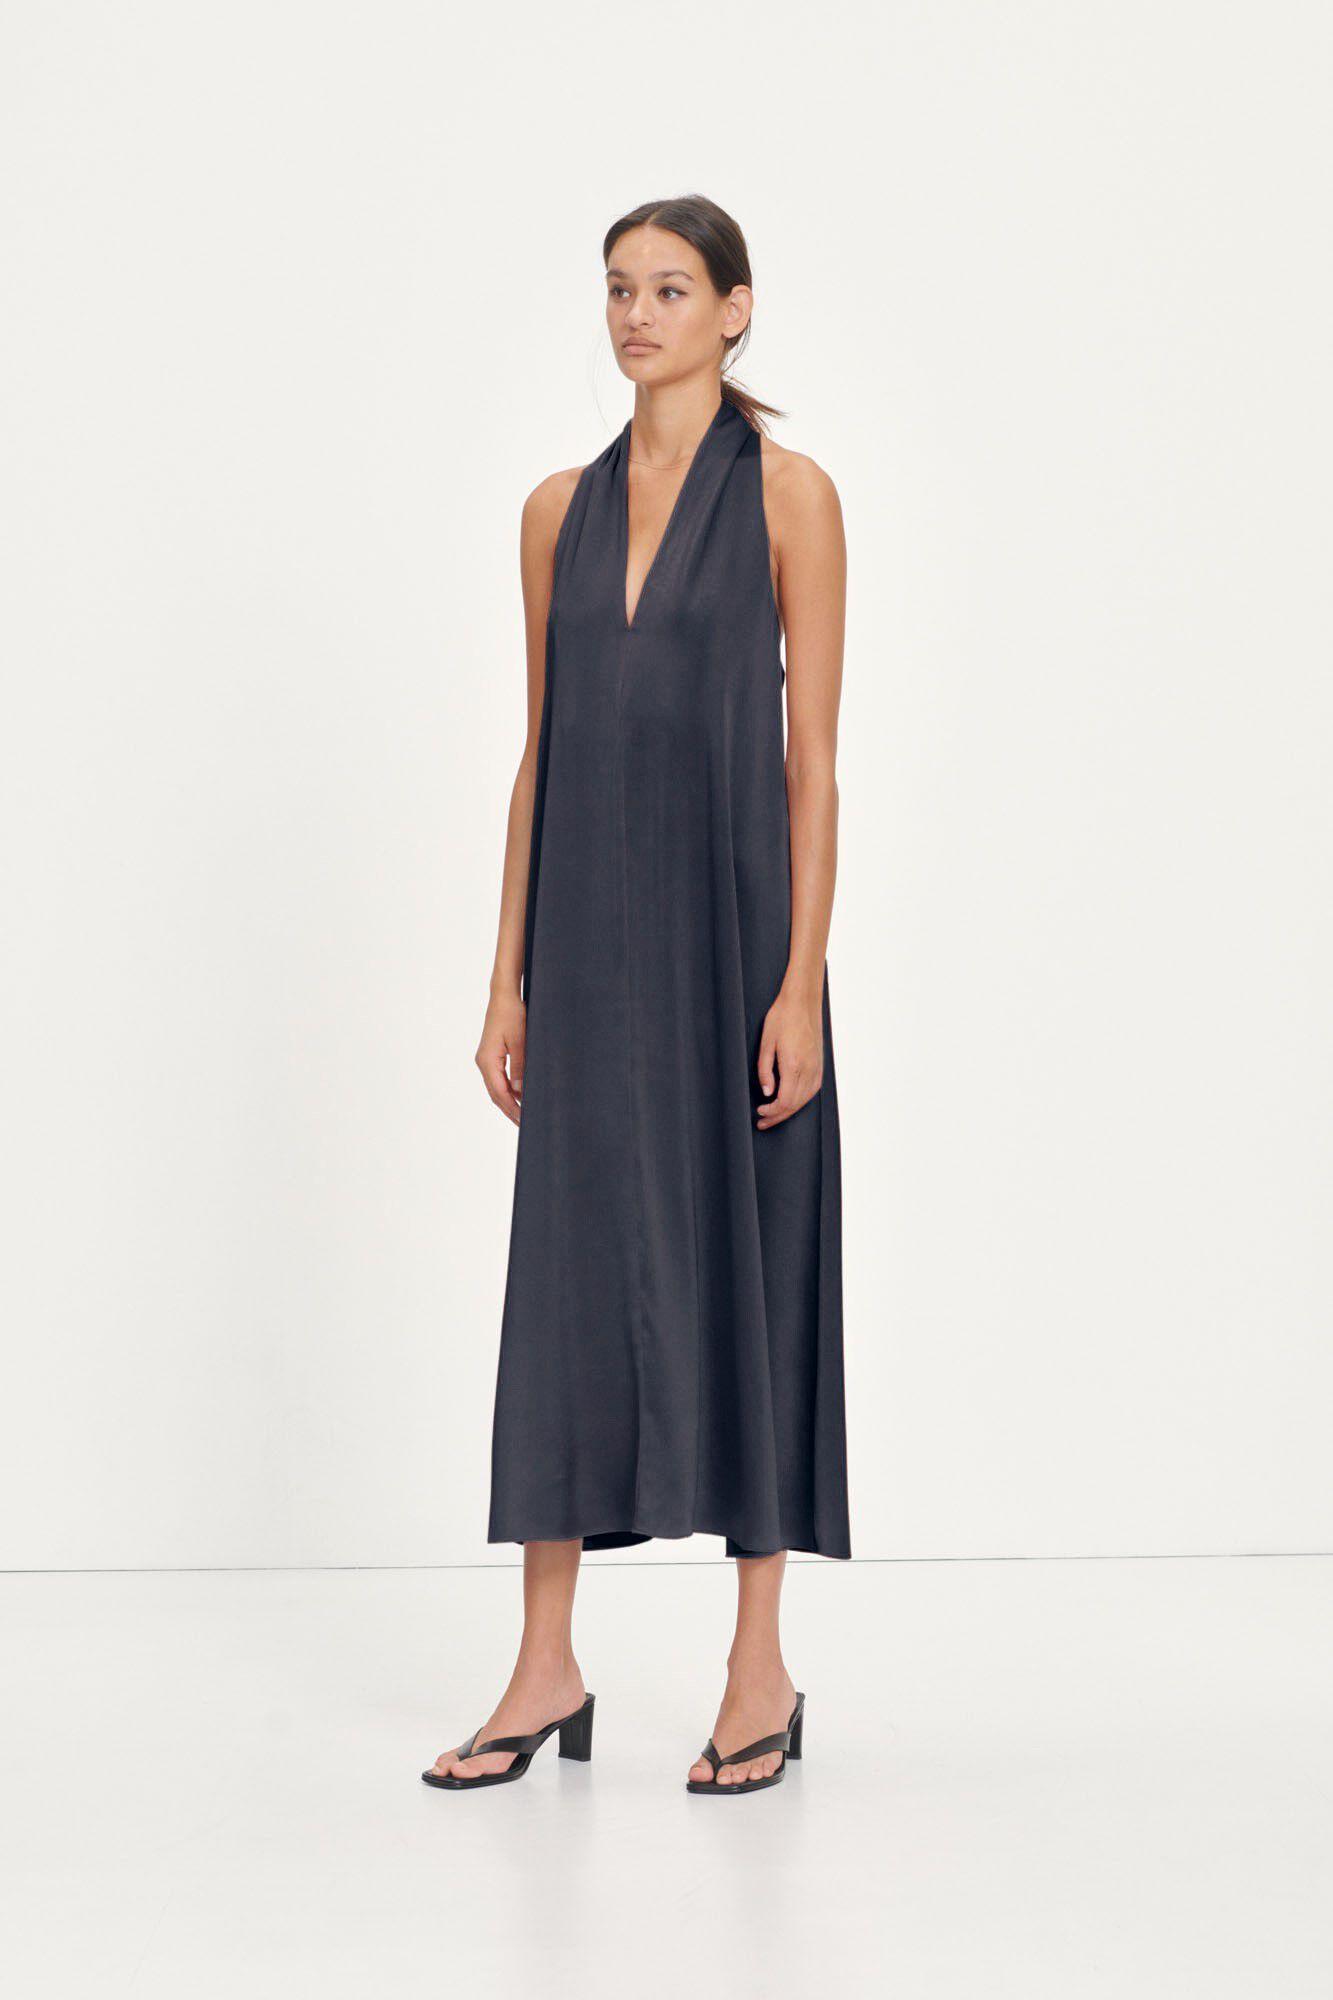 Cille dress 13096, SKY CAPTAIN